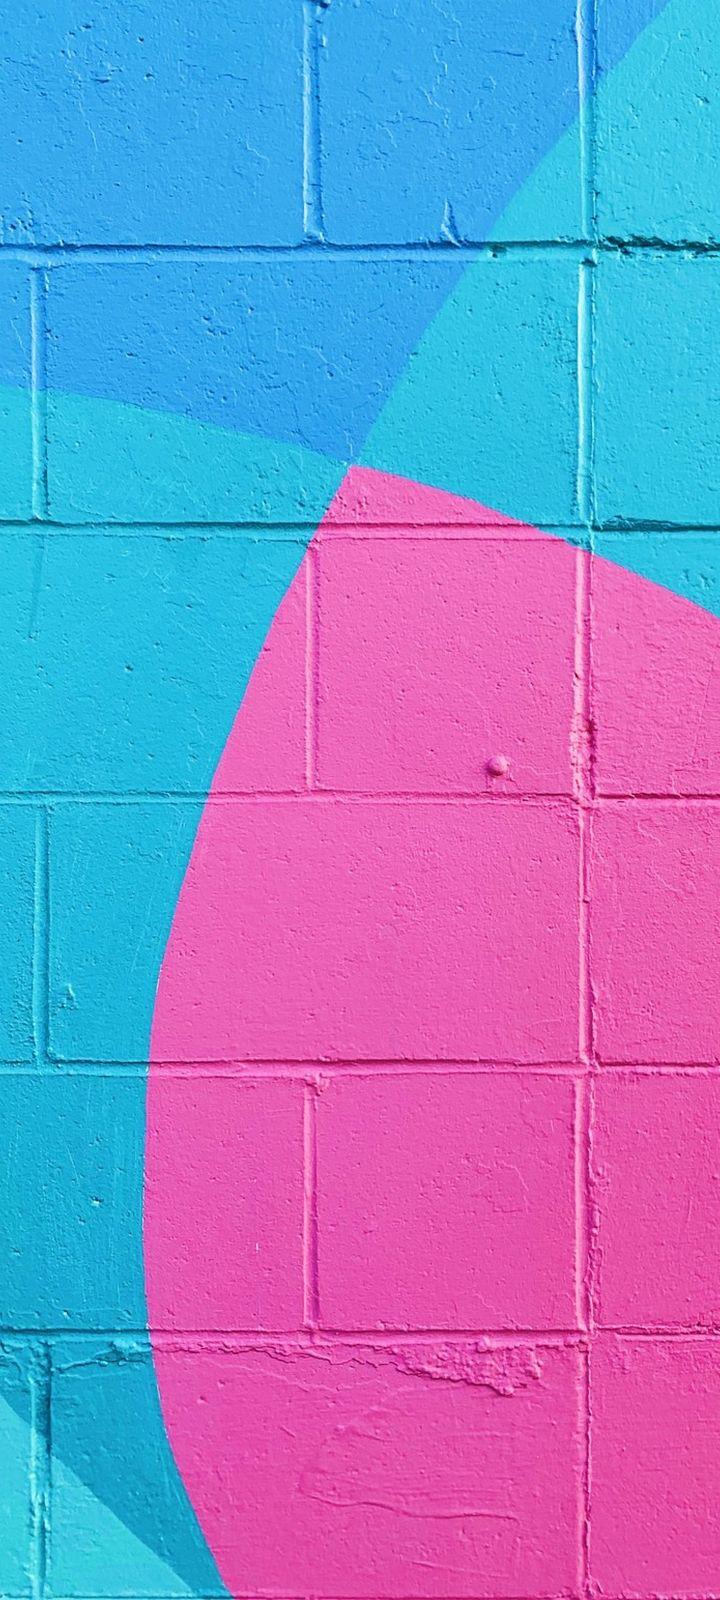 Wall Paint Surface Wallpaper 720x1600